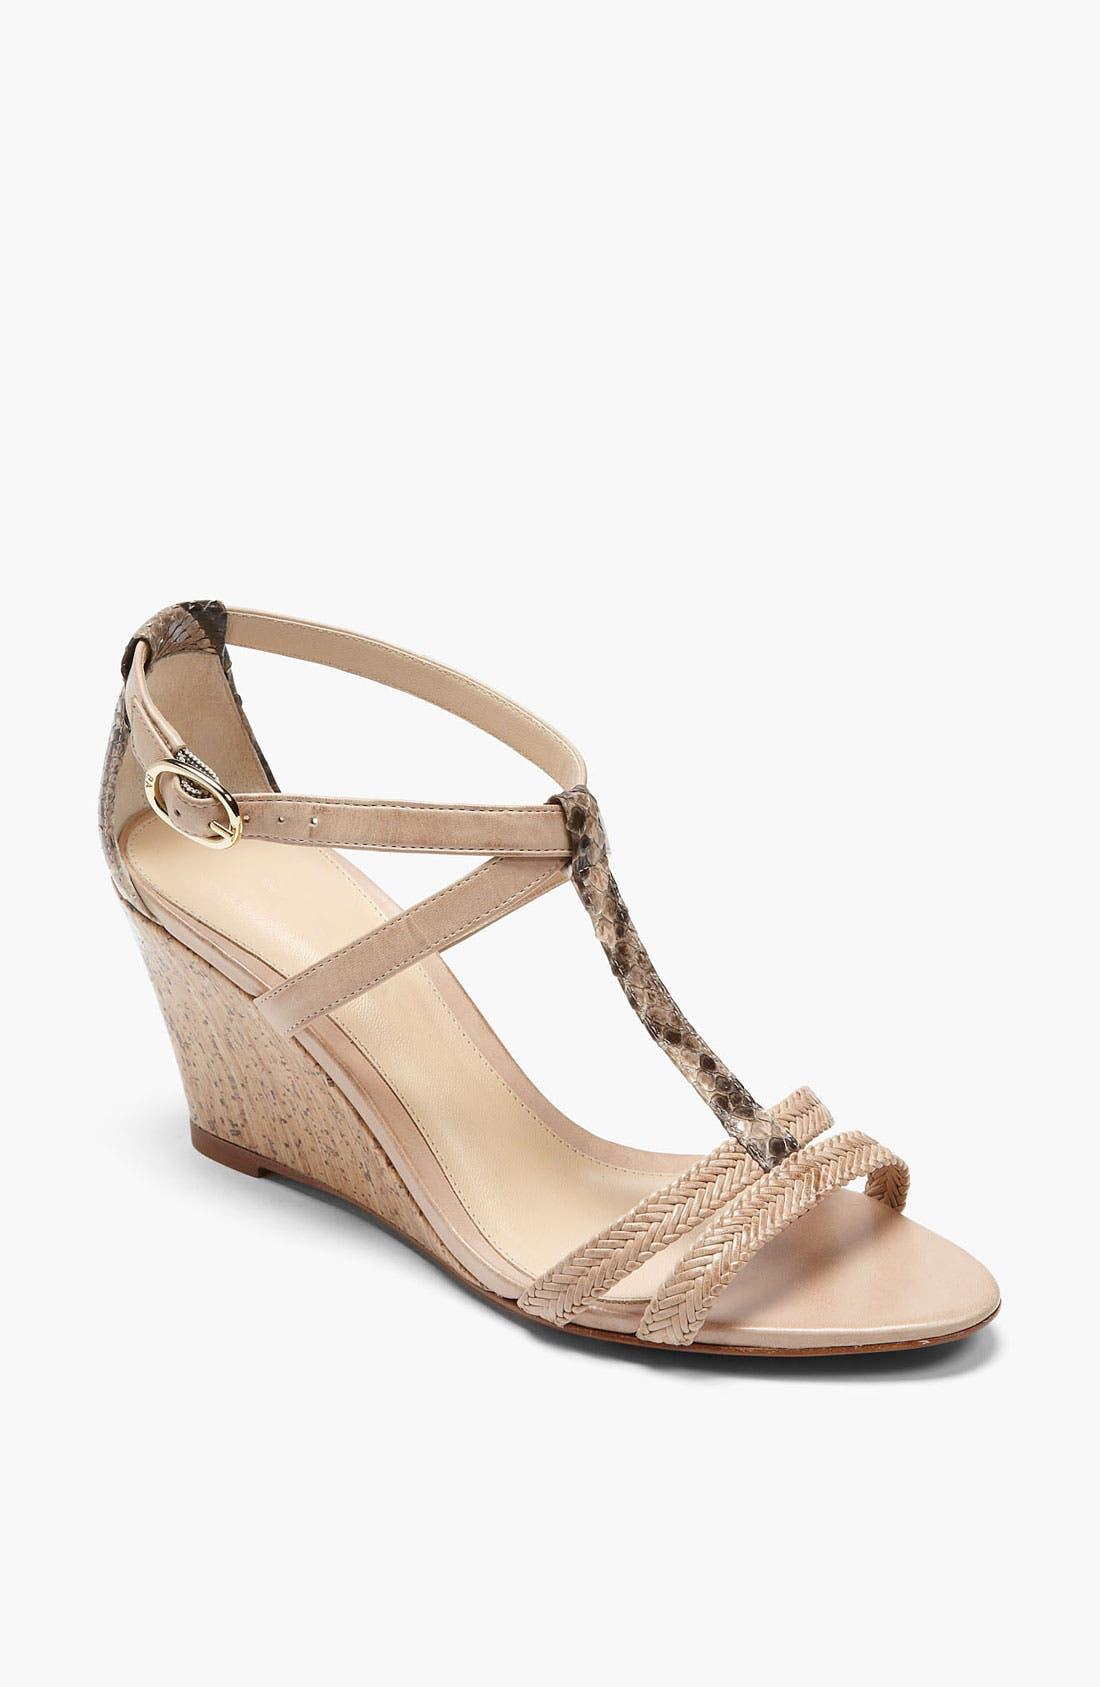 Alternate Image 1 Selected - Alexandre Birman Braid Cork Sandal